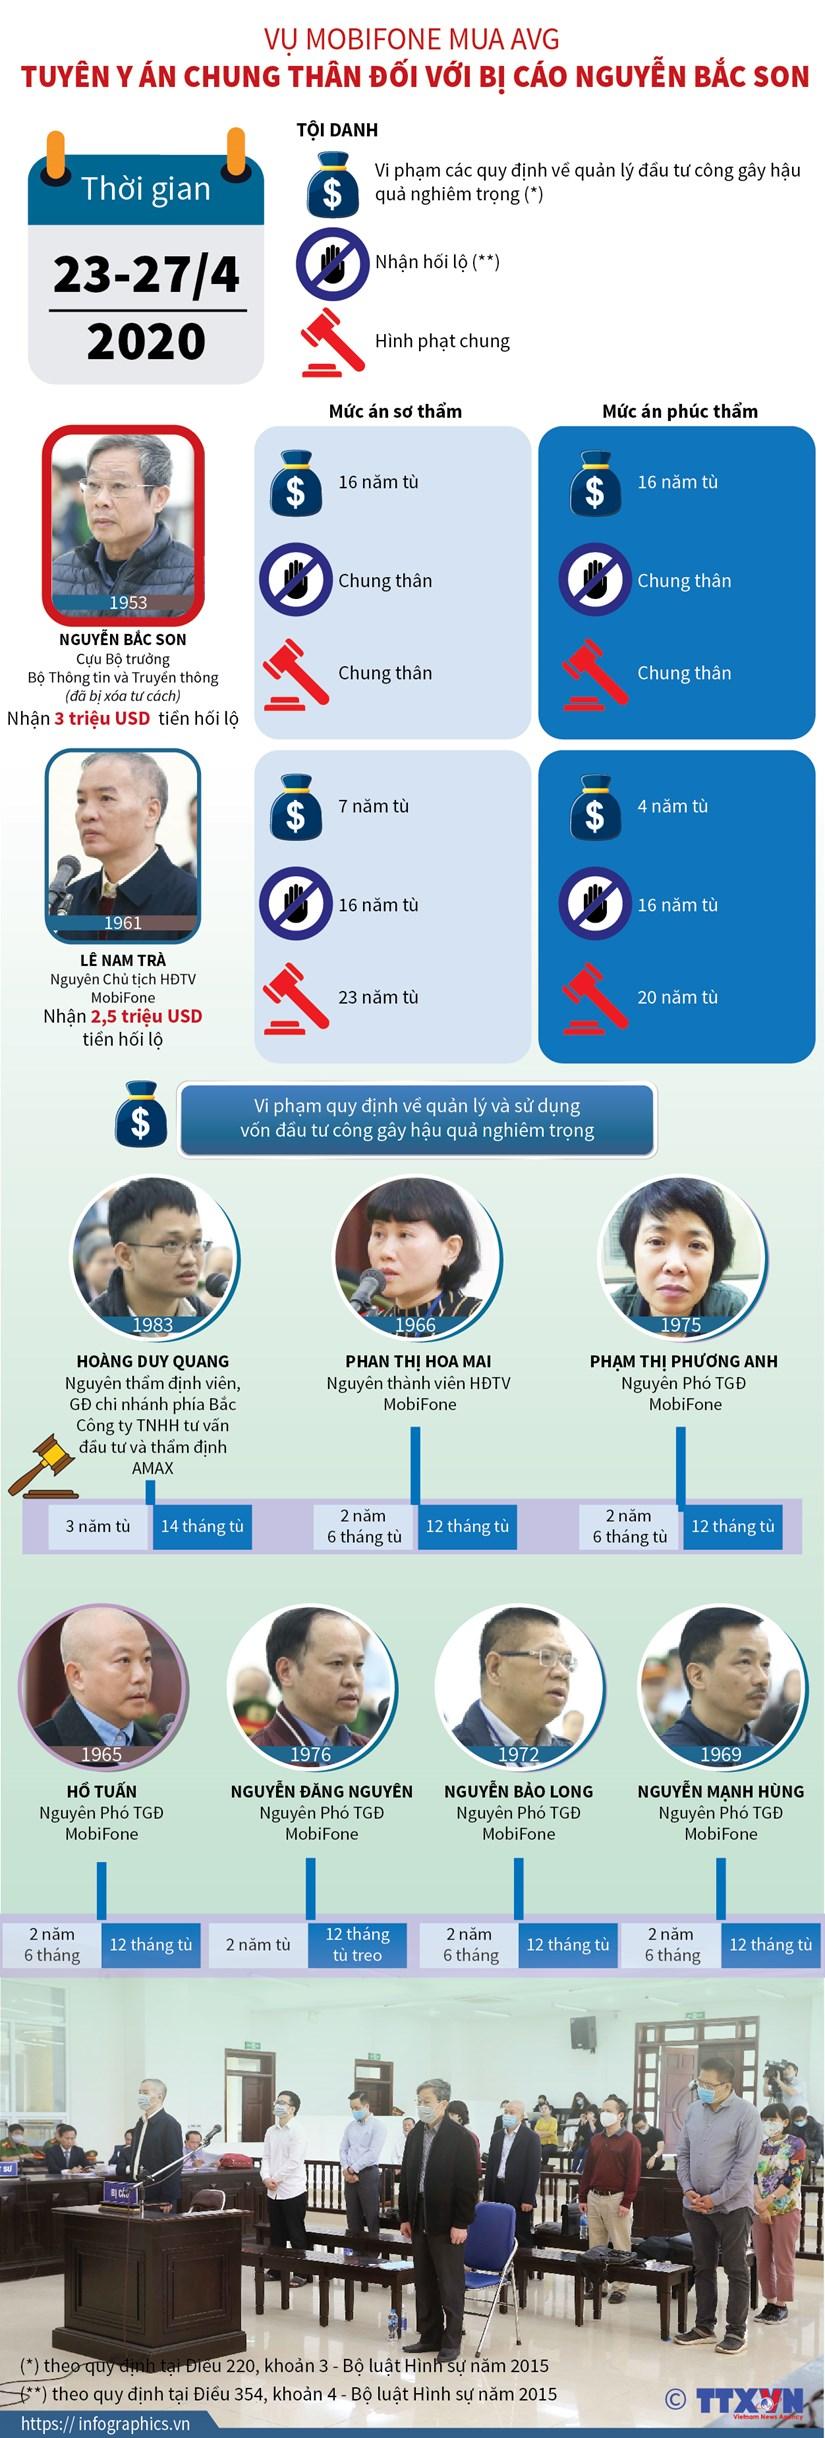 [Infographics] Bi cao Nguyen Bac Son bi tuyen an tu chung than hinh anh 1